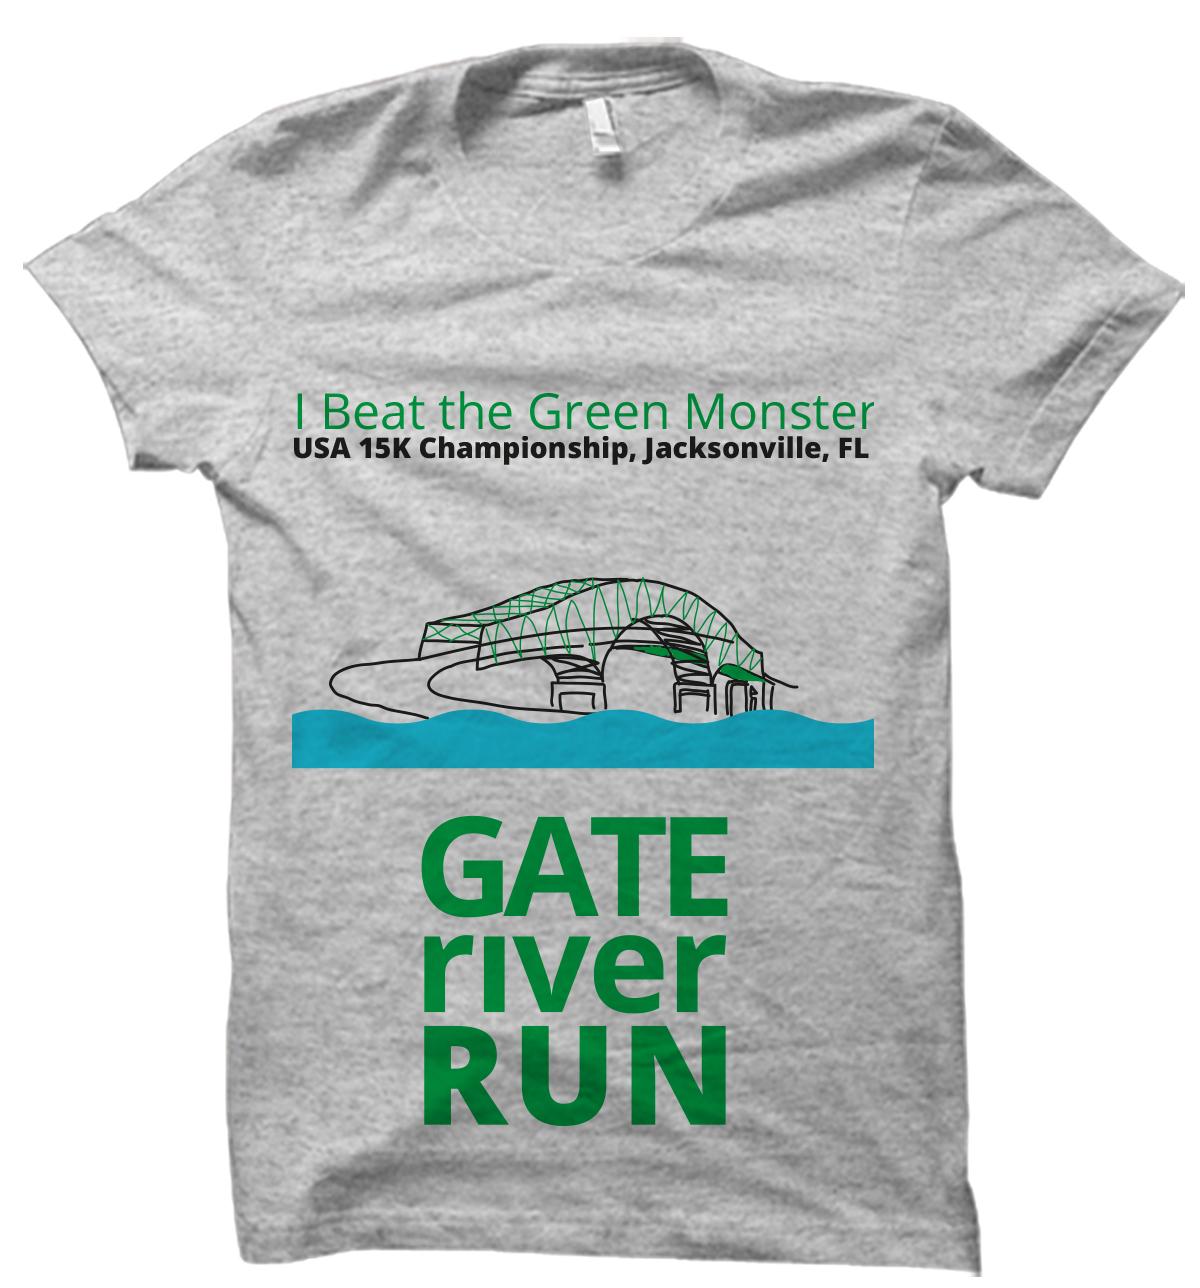 T shirt design jacksonville fl - Professional Modern T Shirt Design For Company In United States Design 6979184